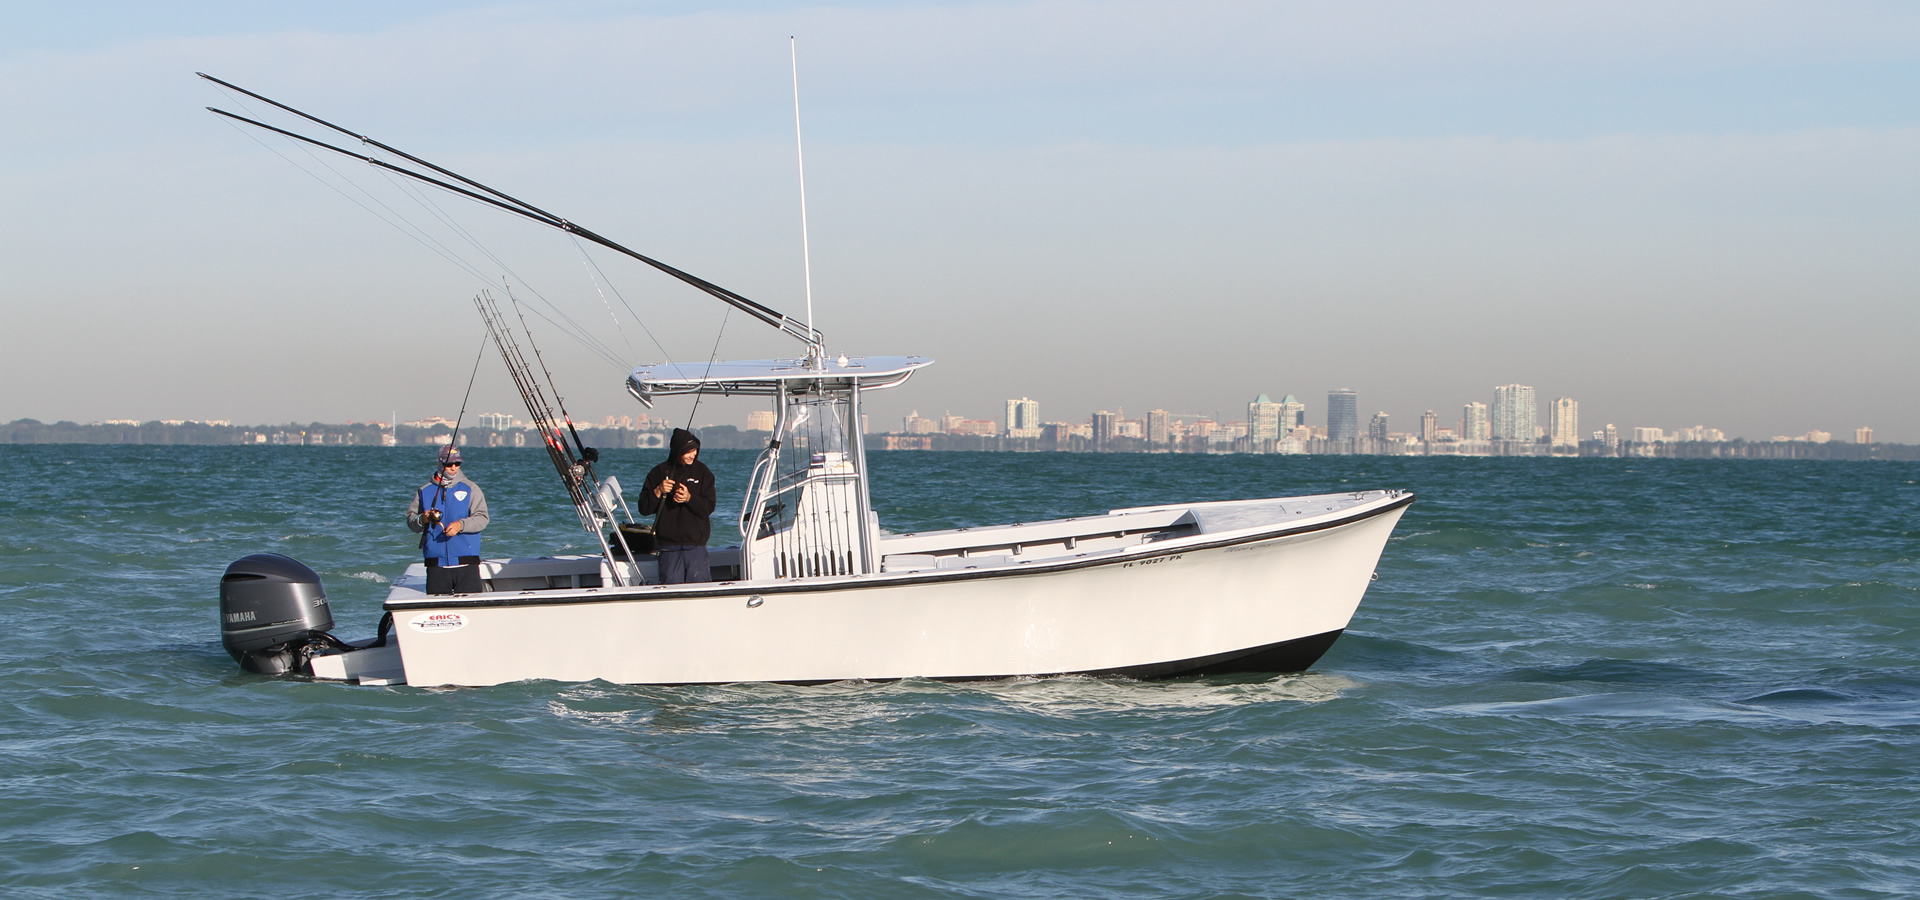 Miss Cheyenne - 26' Boat